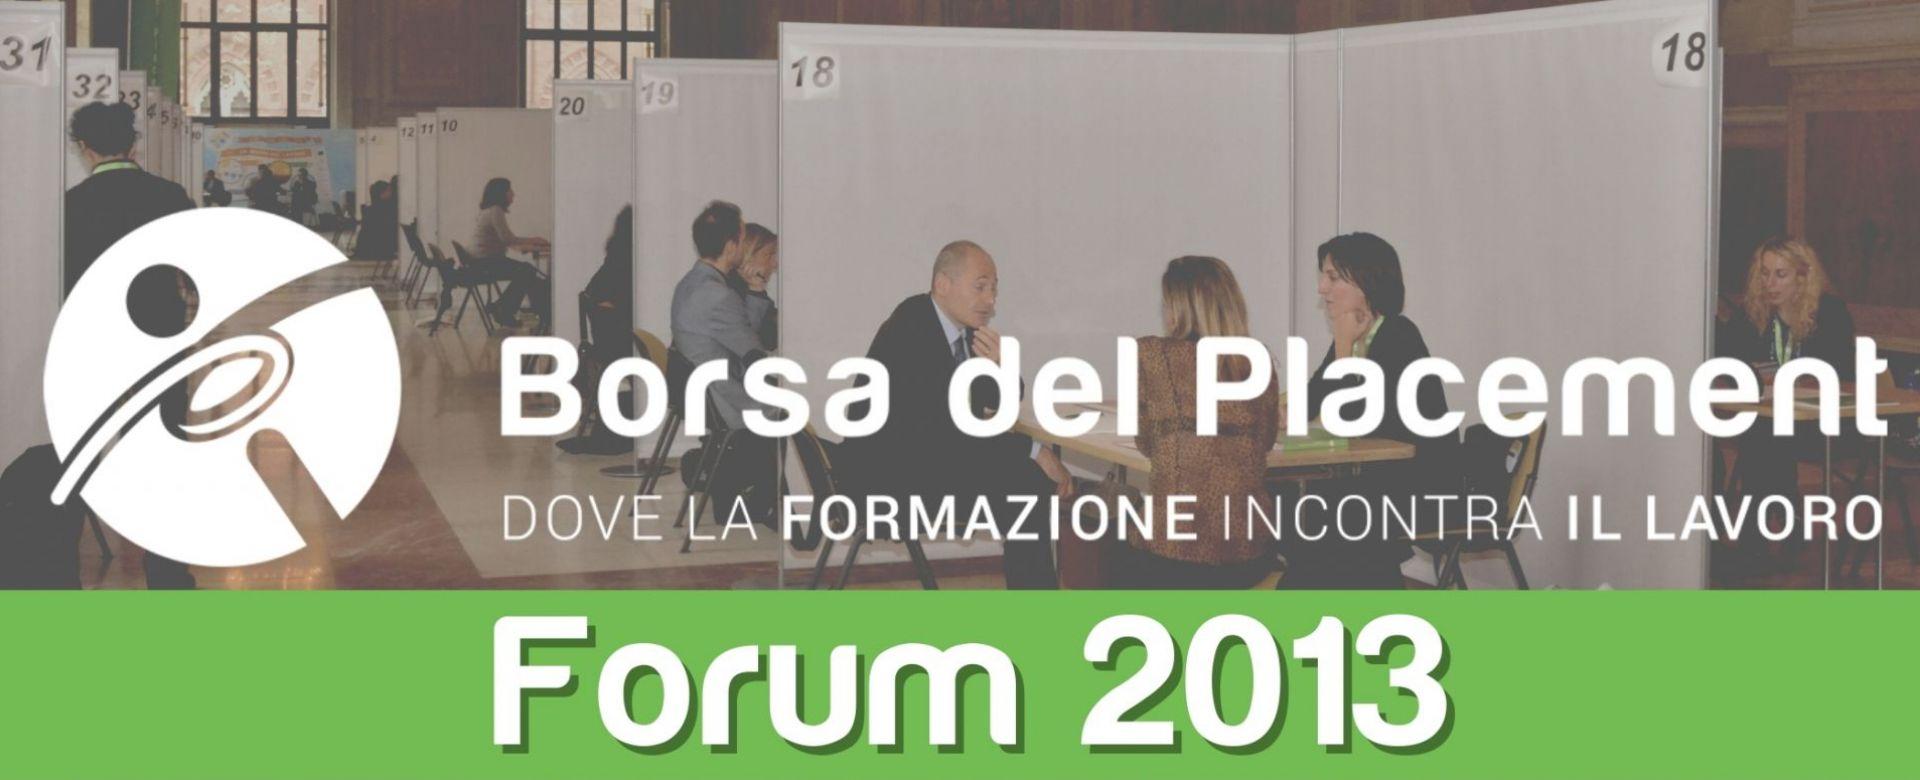 31.10.2013 - Borsa del Placement   VII Forum